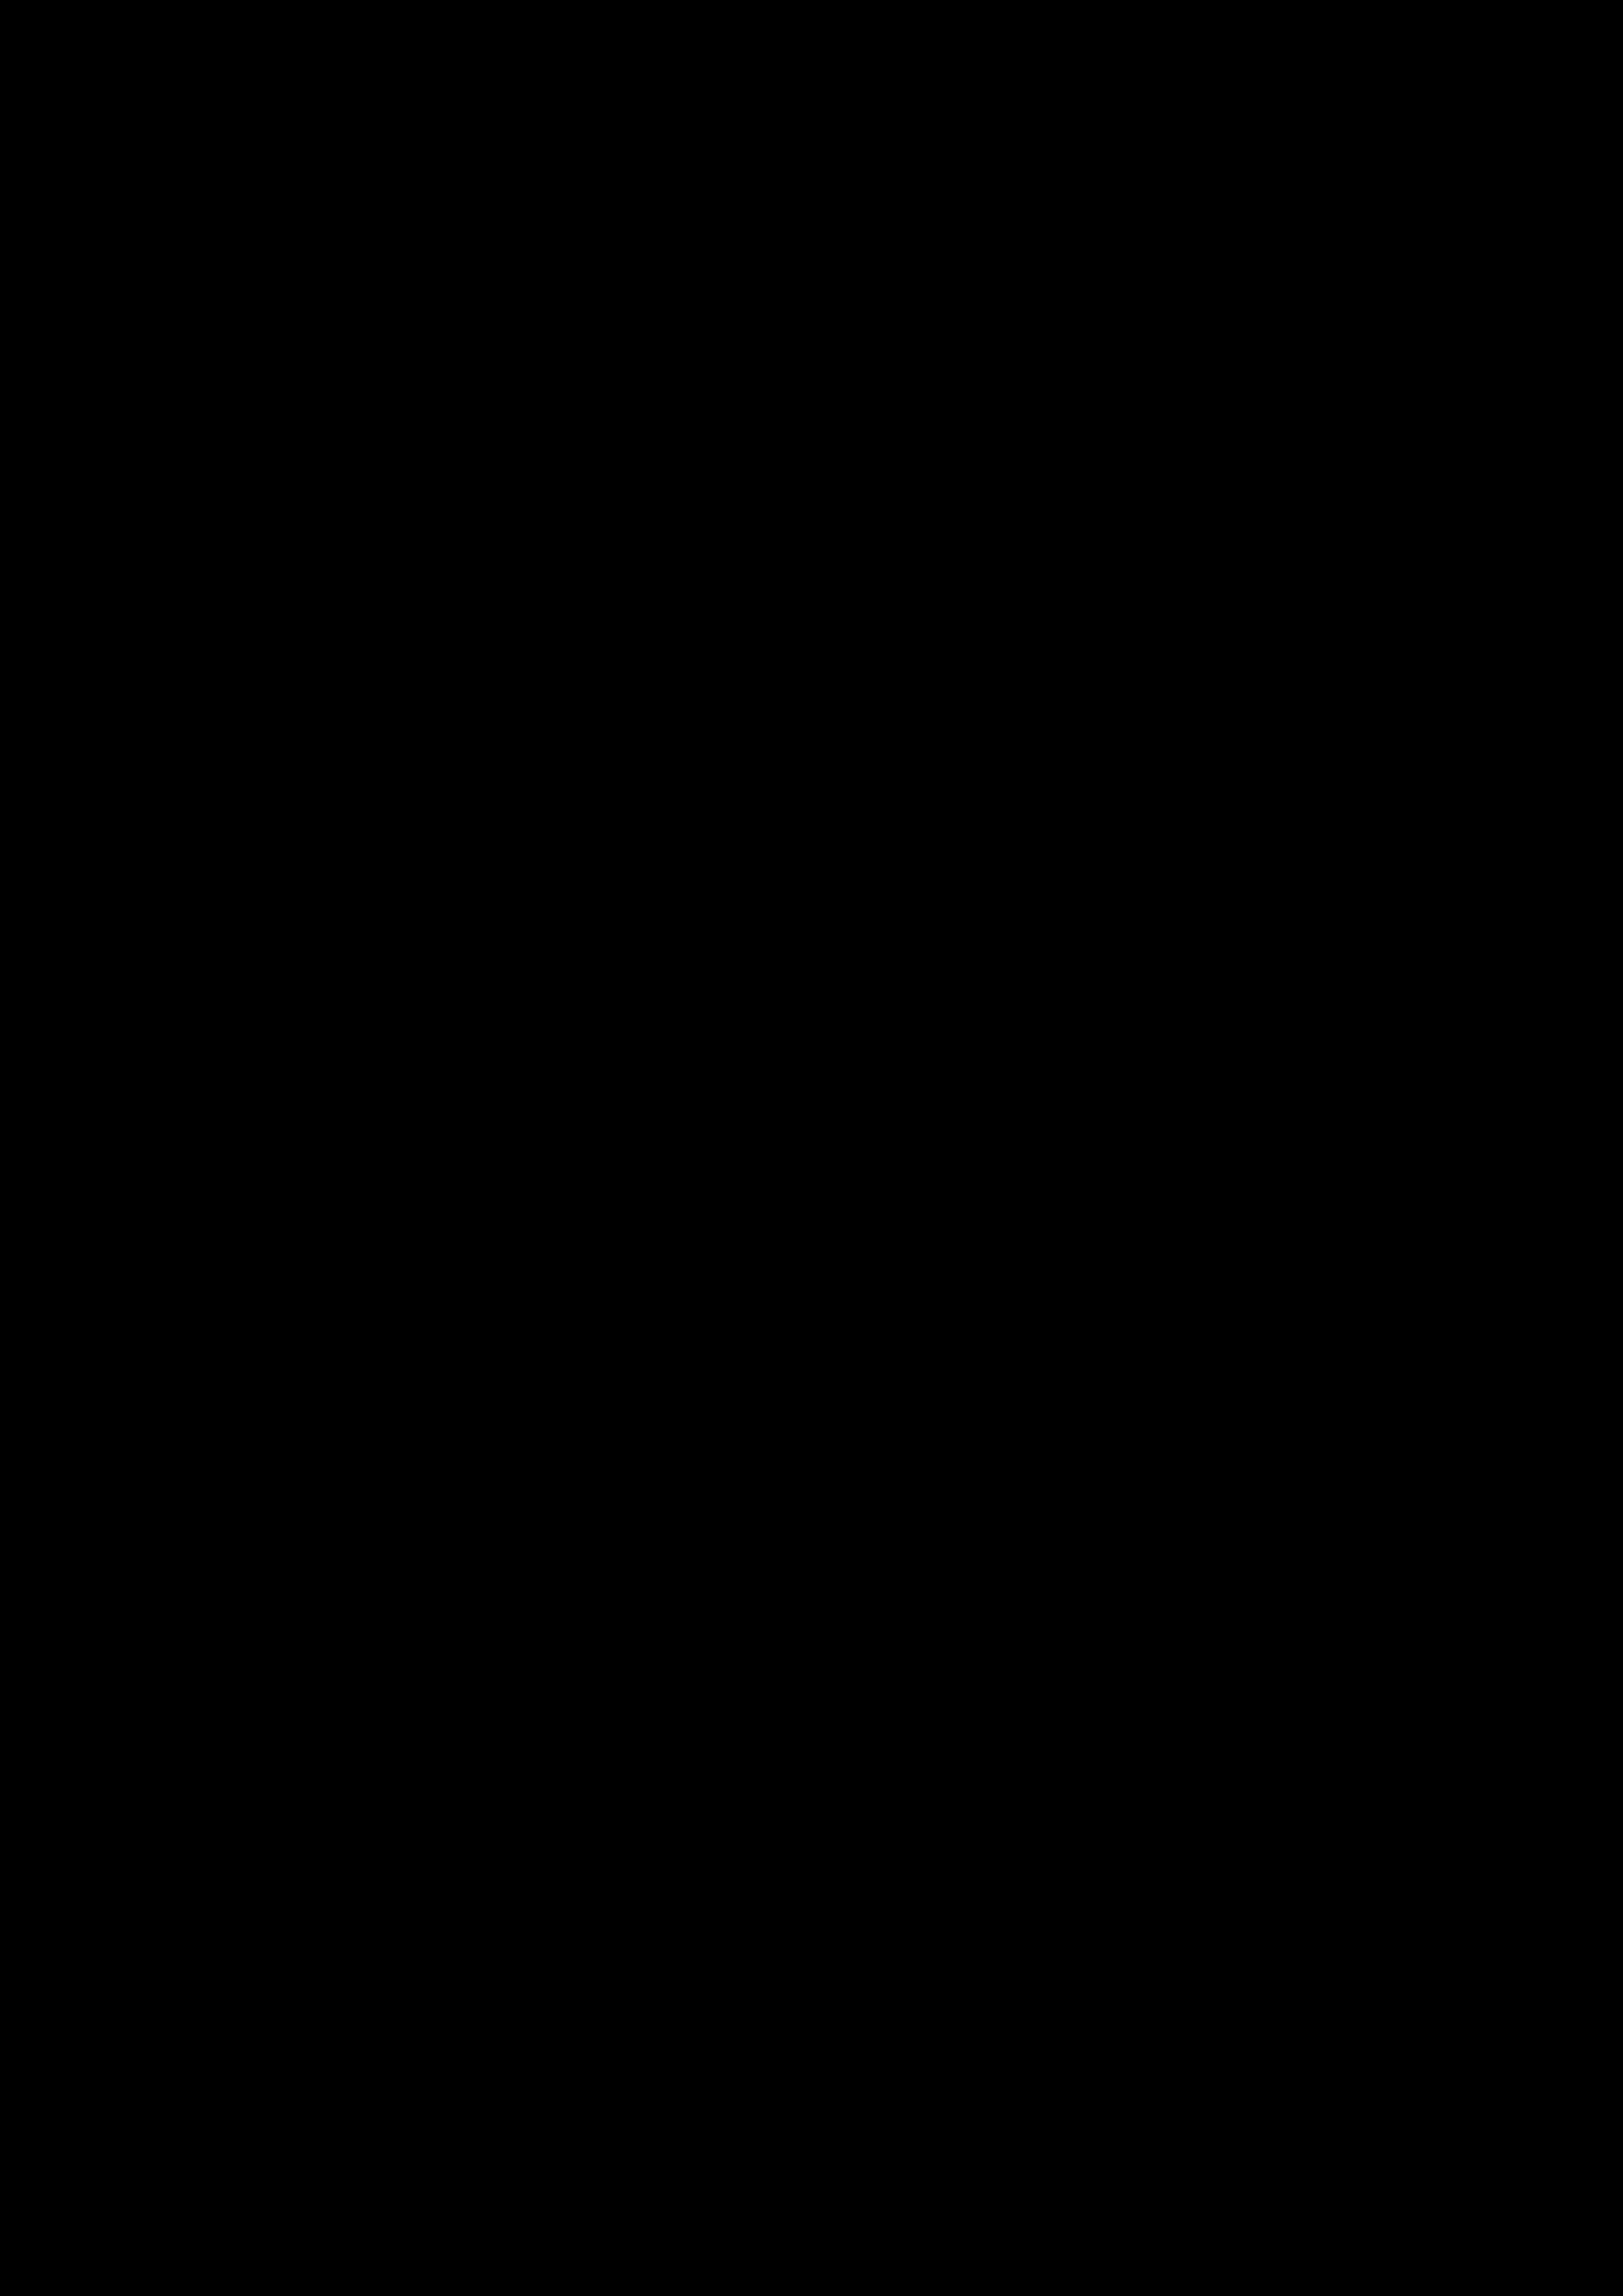 Black Picture Frames 1697x2400 Clipart